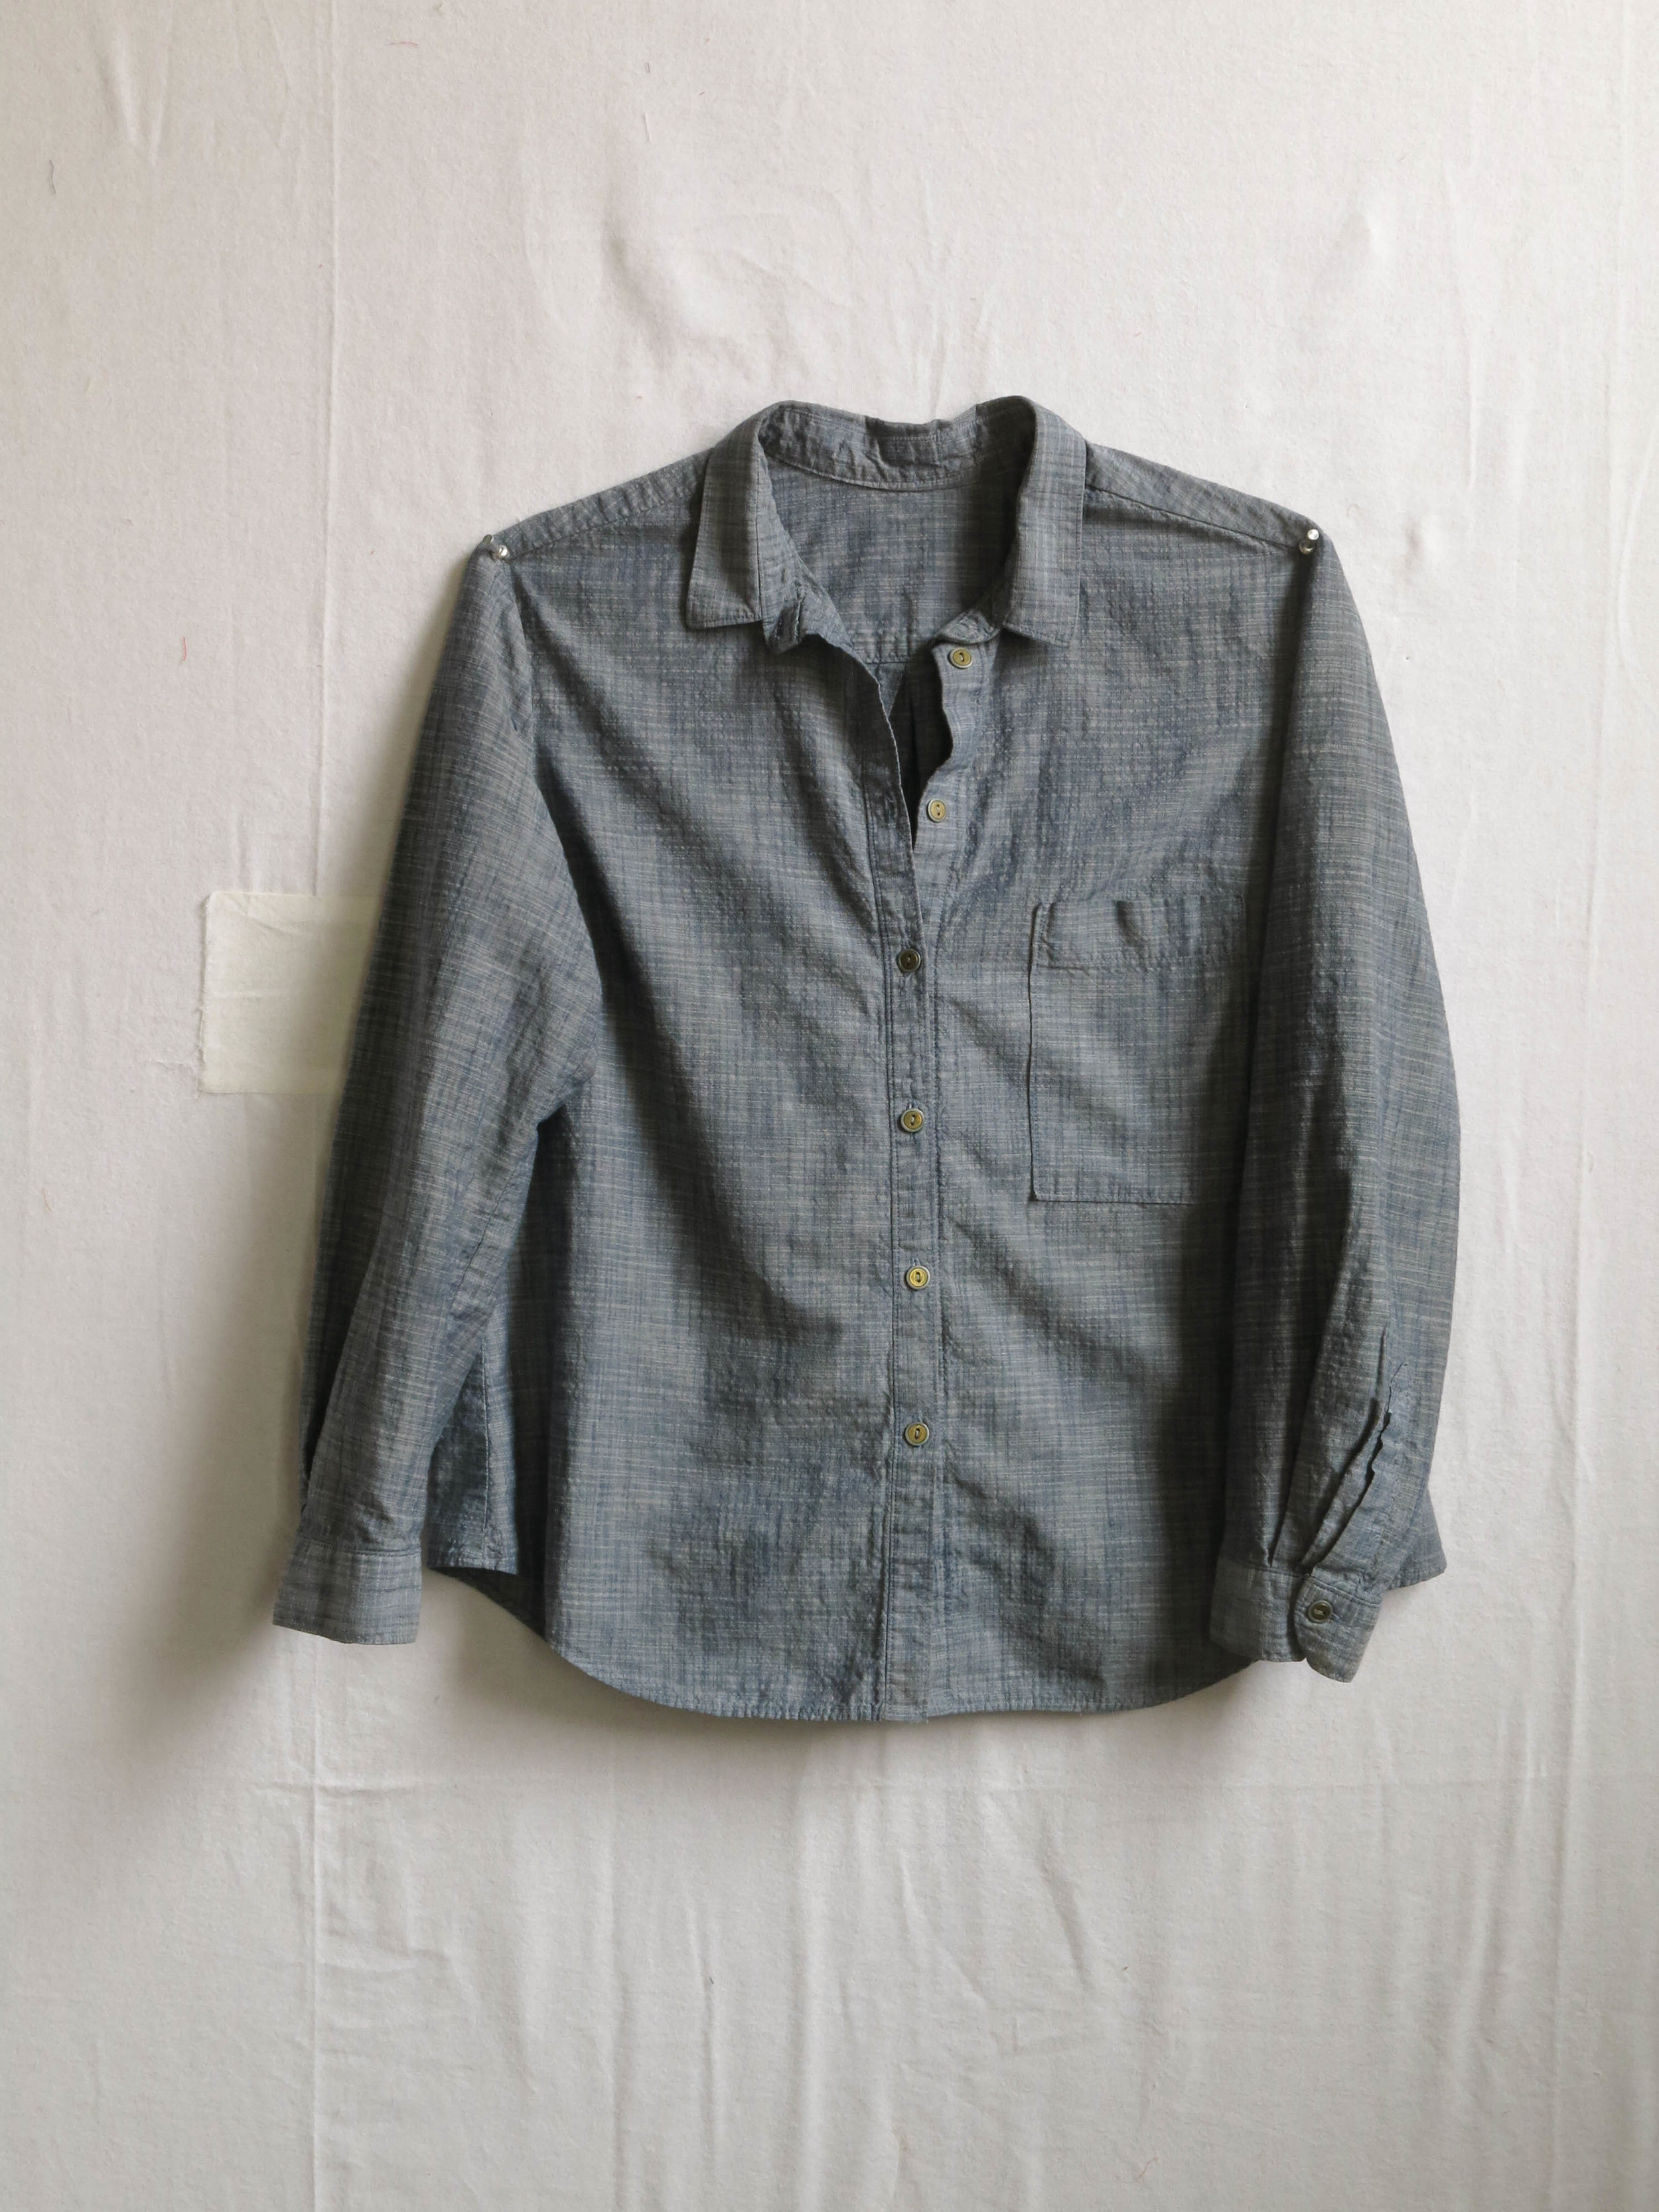 An Archer shirt, pattern by Jen Beeman of Grainline Studio, in chambray from Robert Kaufman.